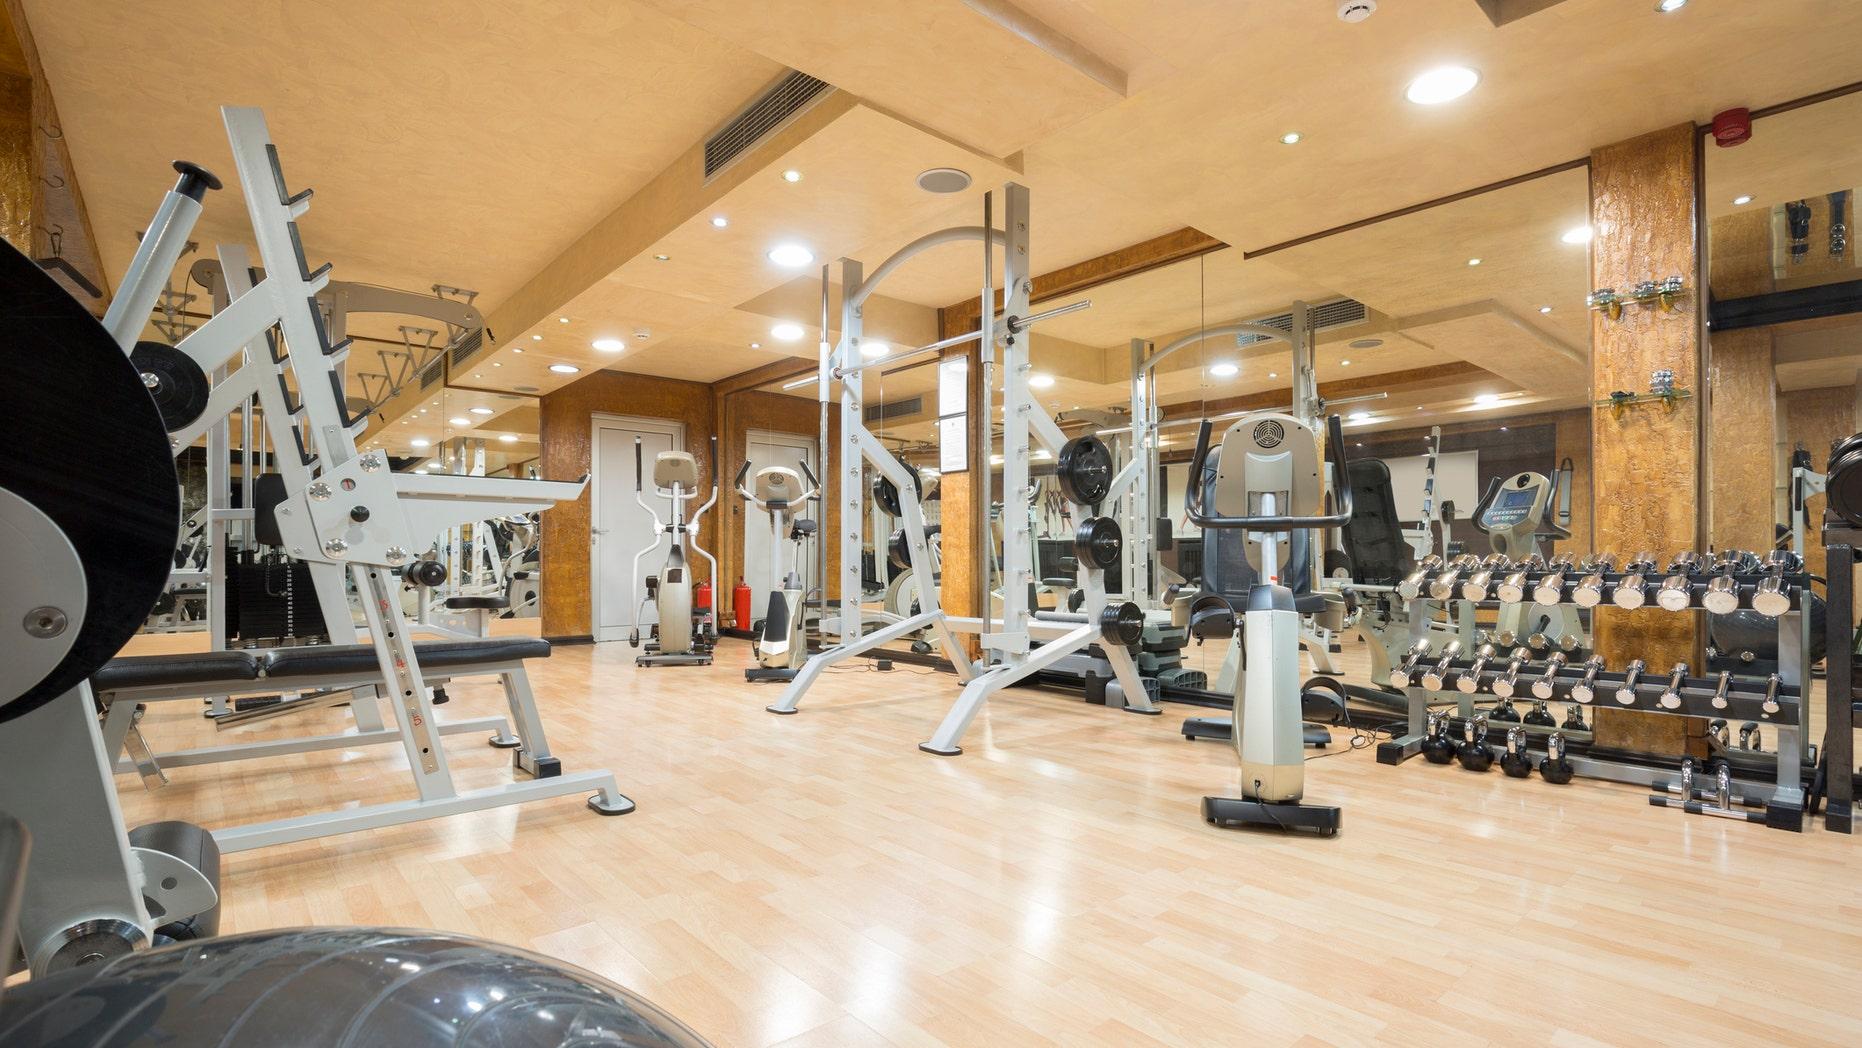 Interior of a modern gym